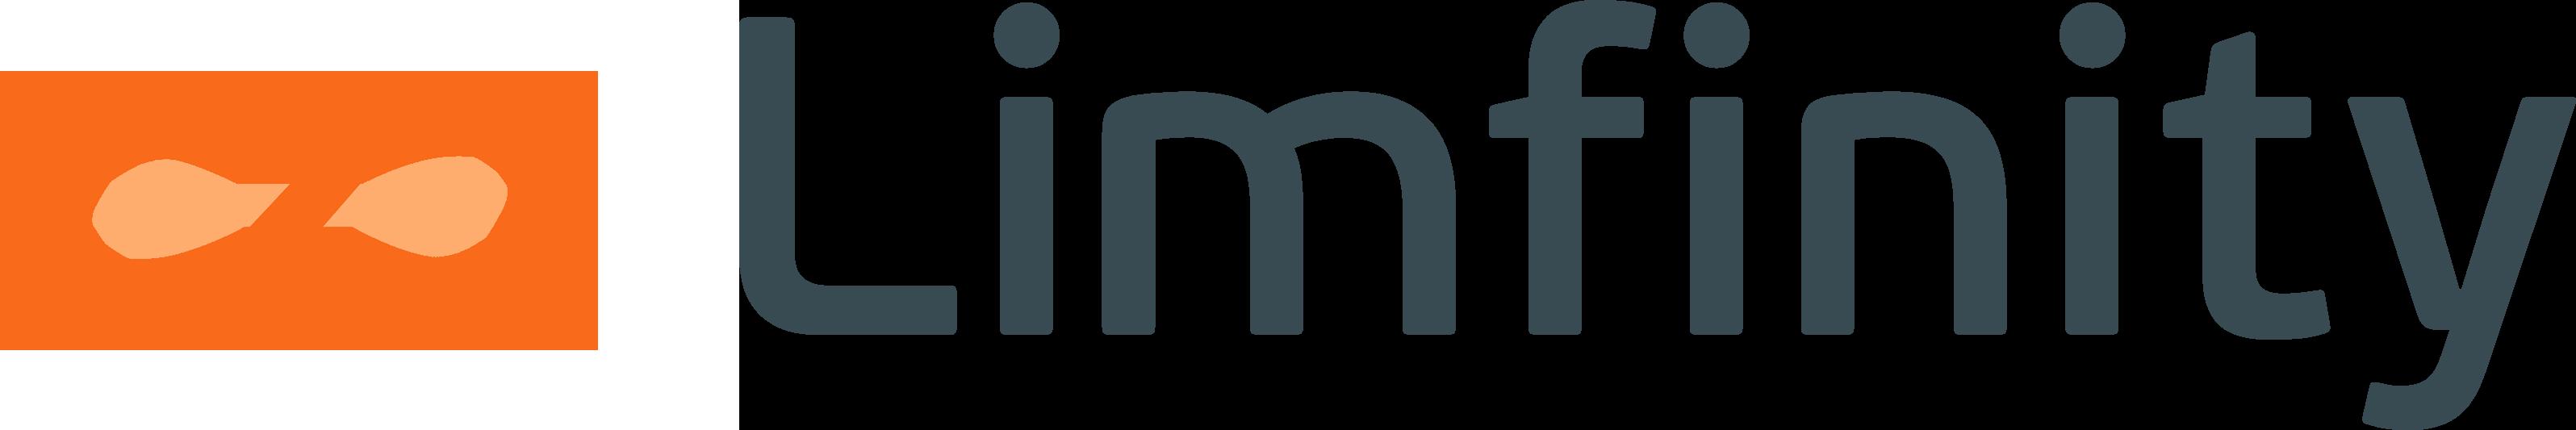 limfinity_logo